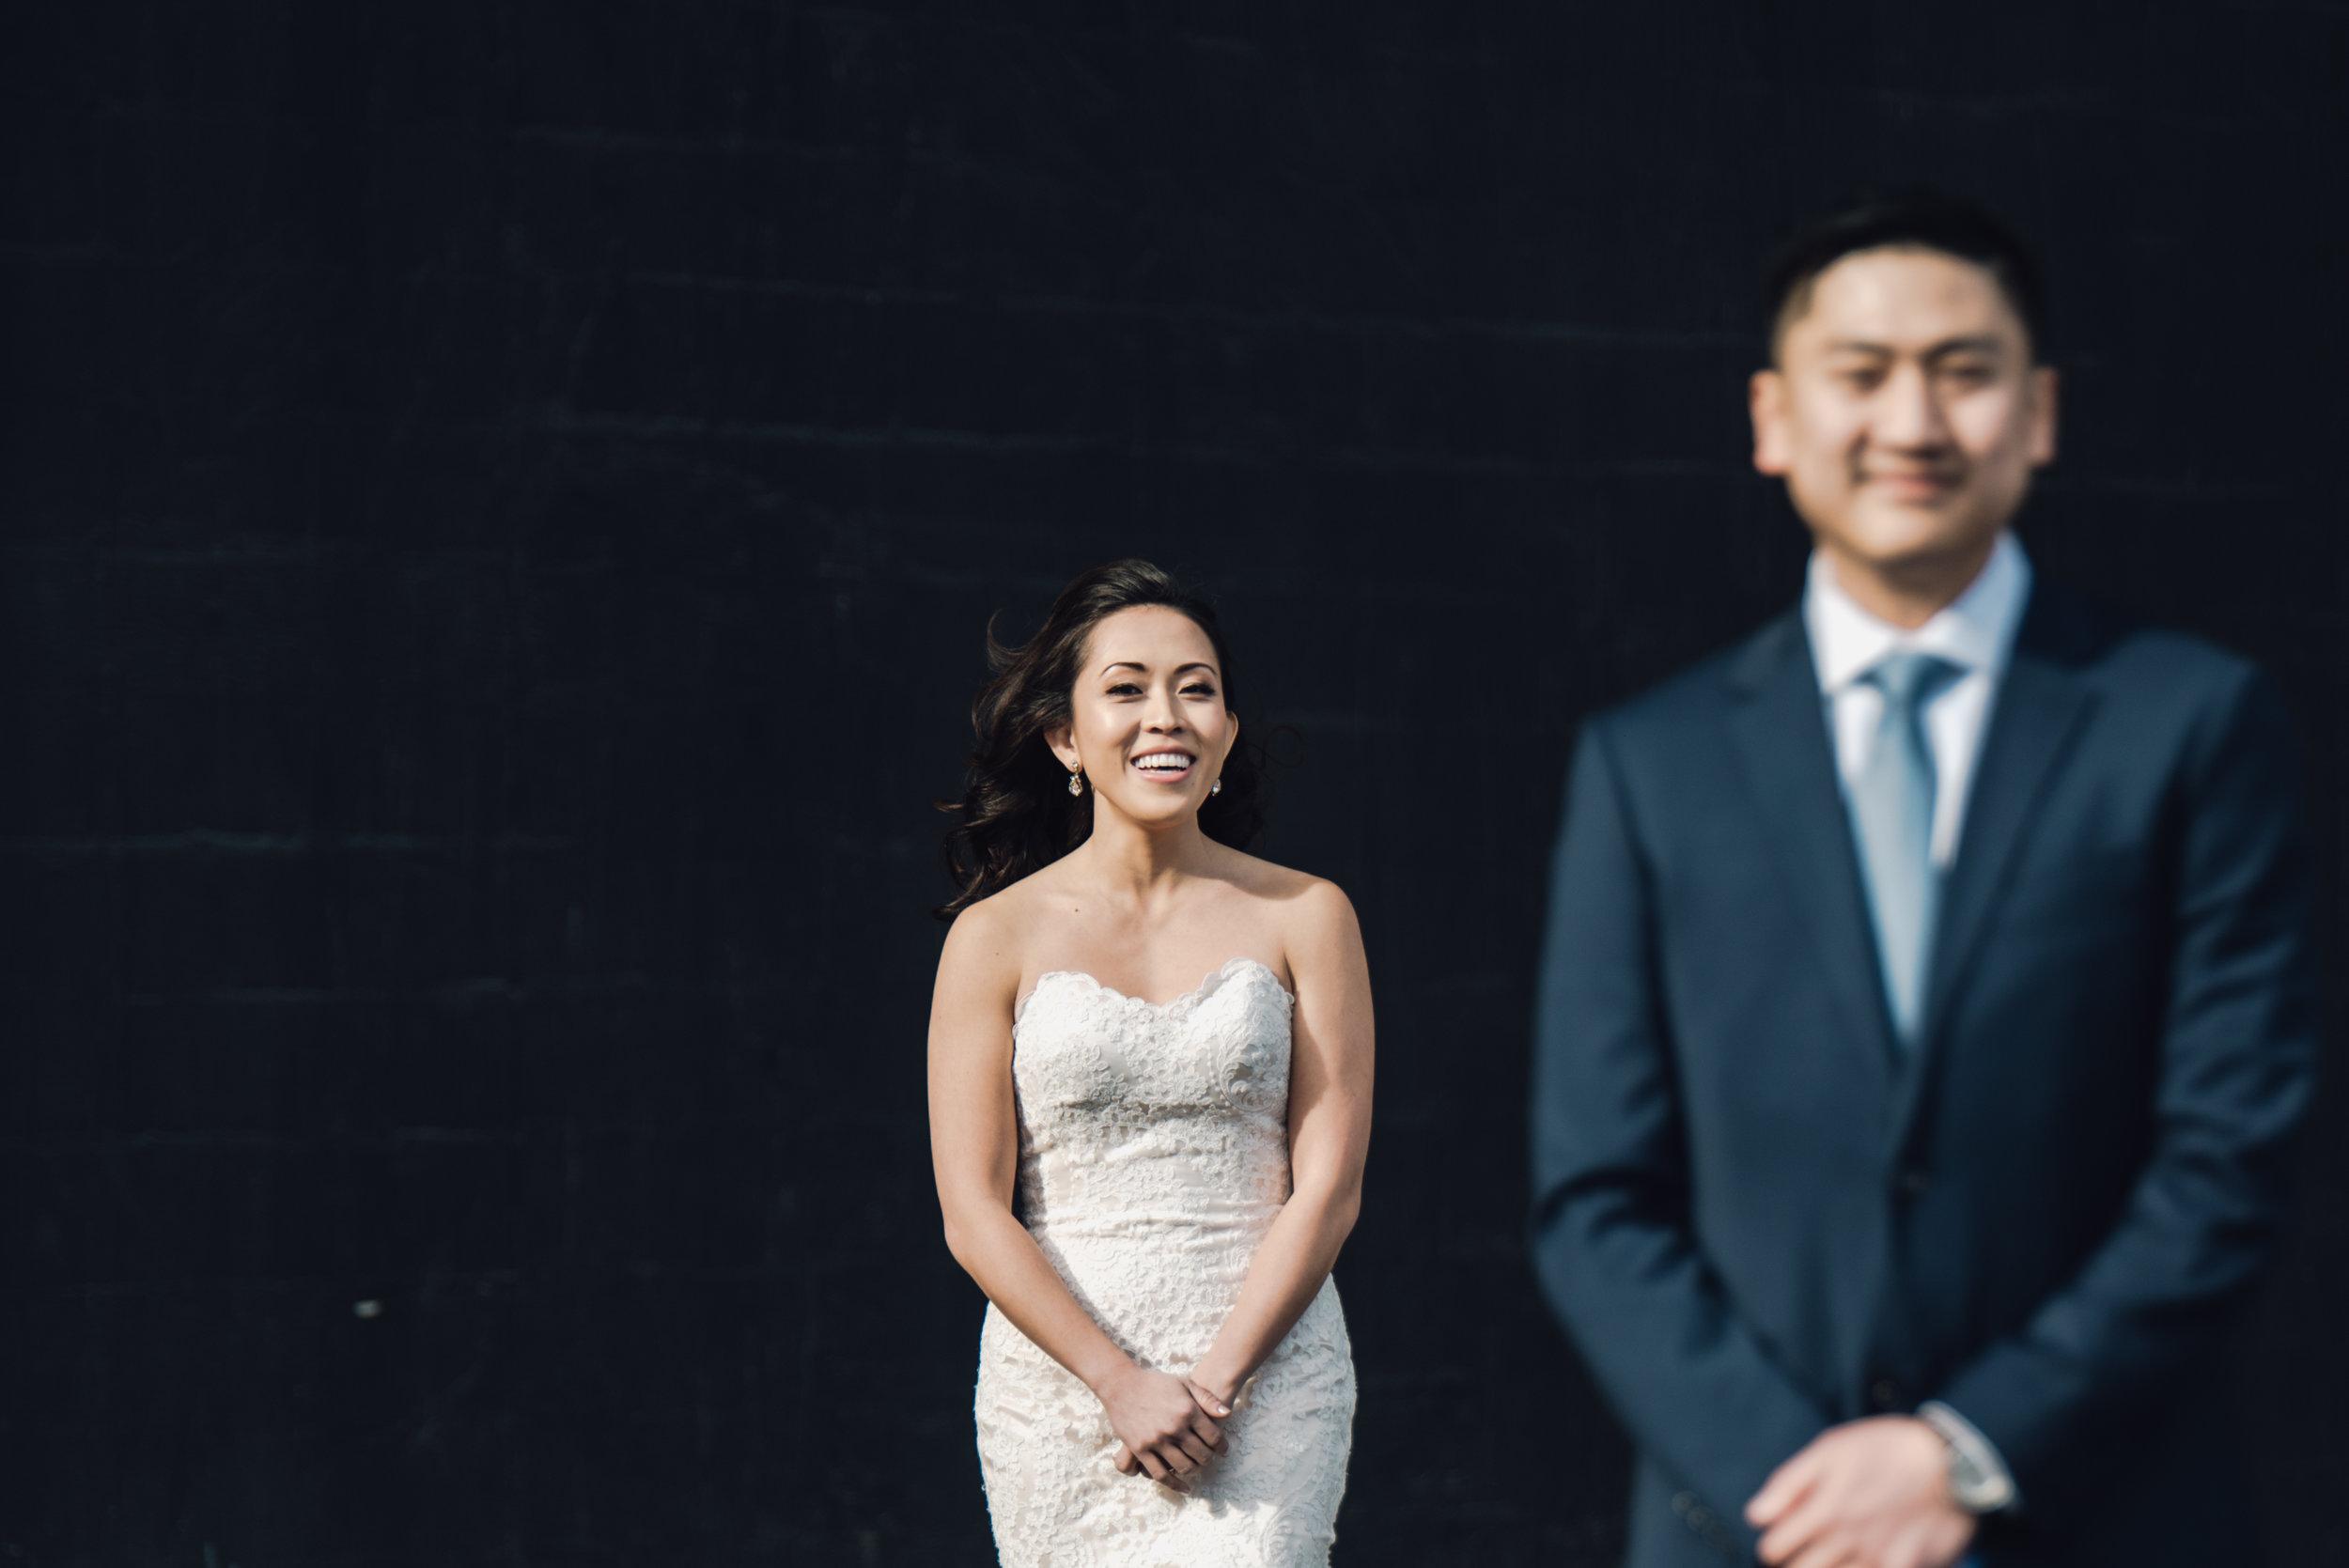 Main and Simple Photography_2018_Weddings_DC_K+T-446.jpg